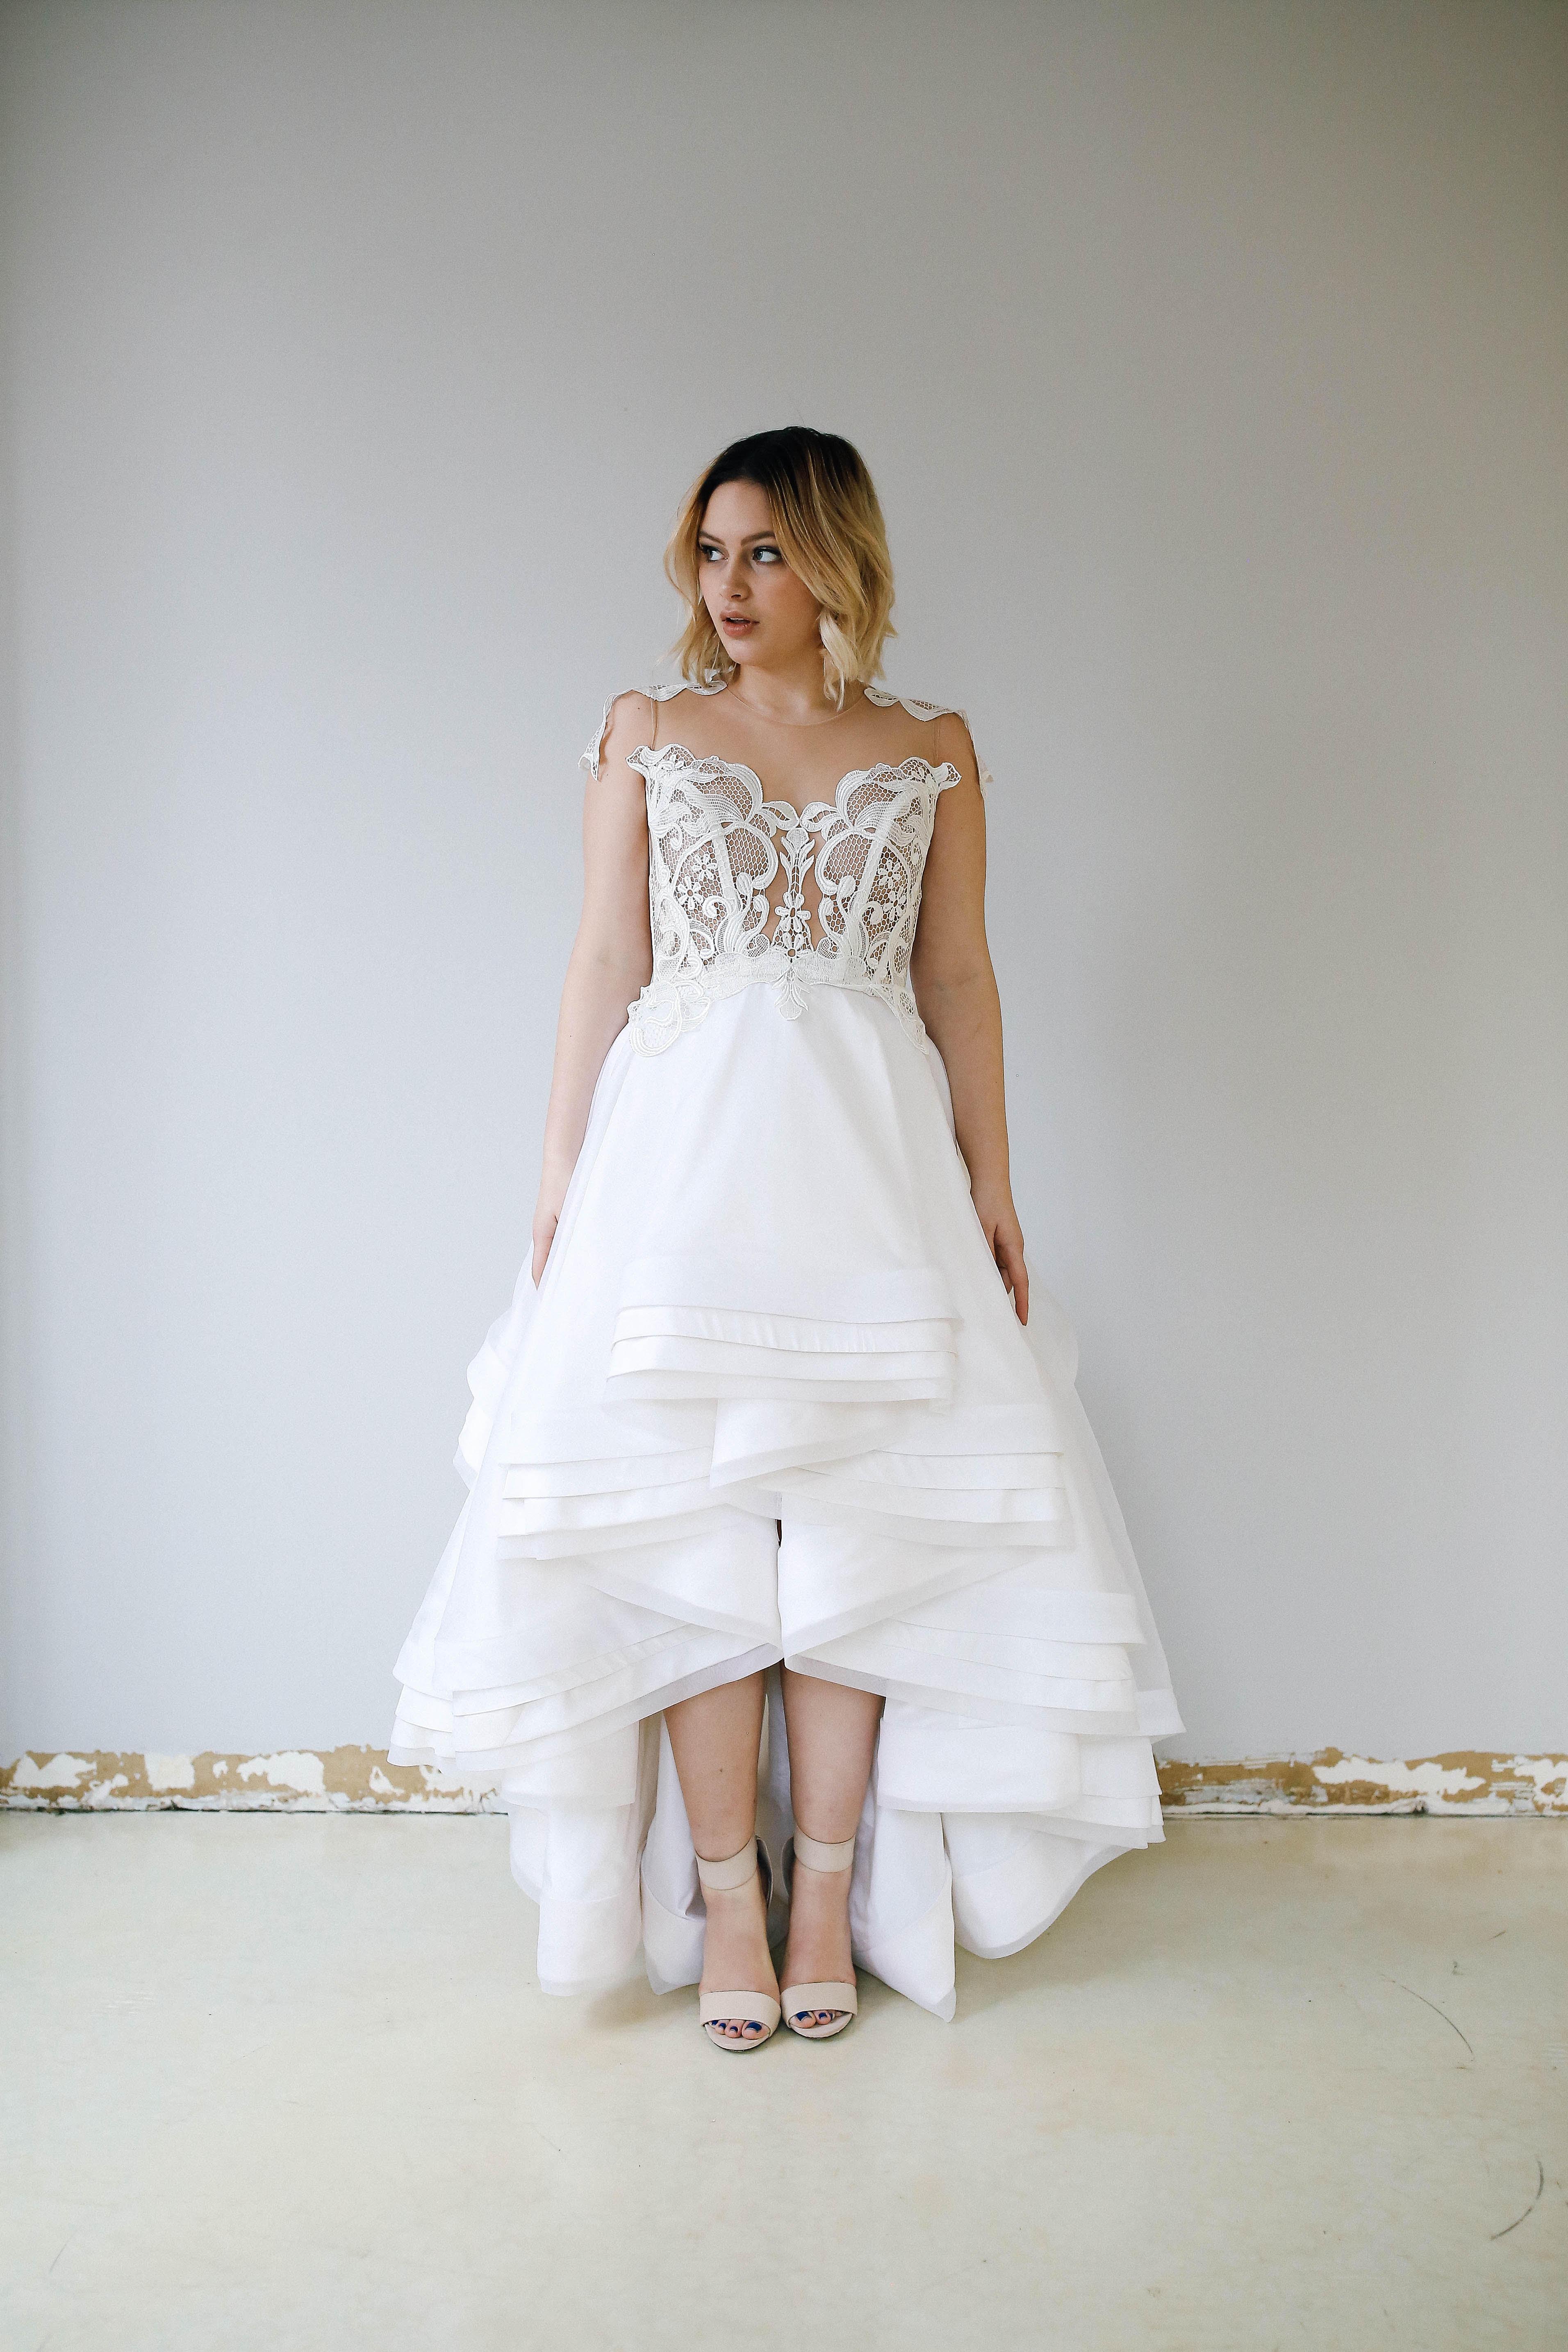 Priscilla costa bridal trunk show at arielle bridal for Wedding dress trunk shows